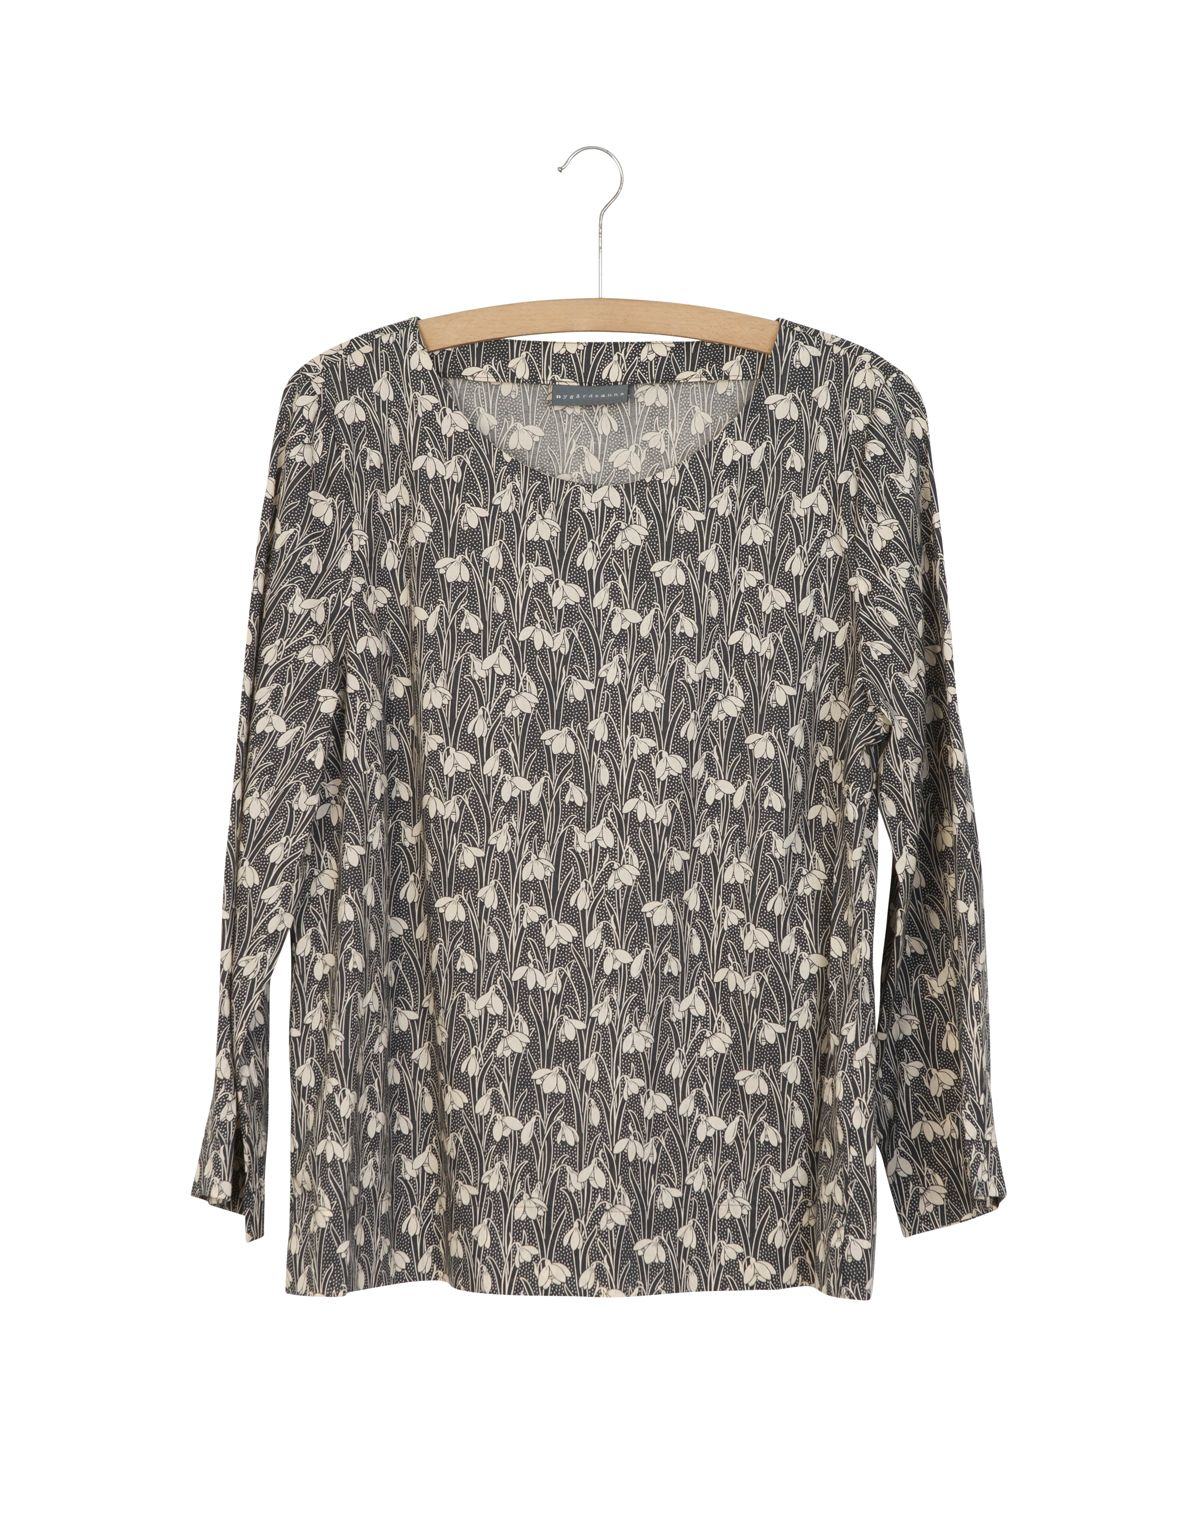 Nygårdsanna 3/4 sleeve blouse